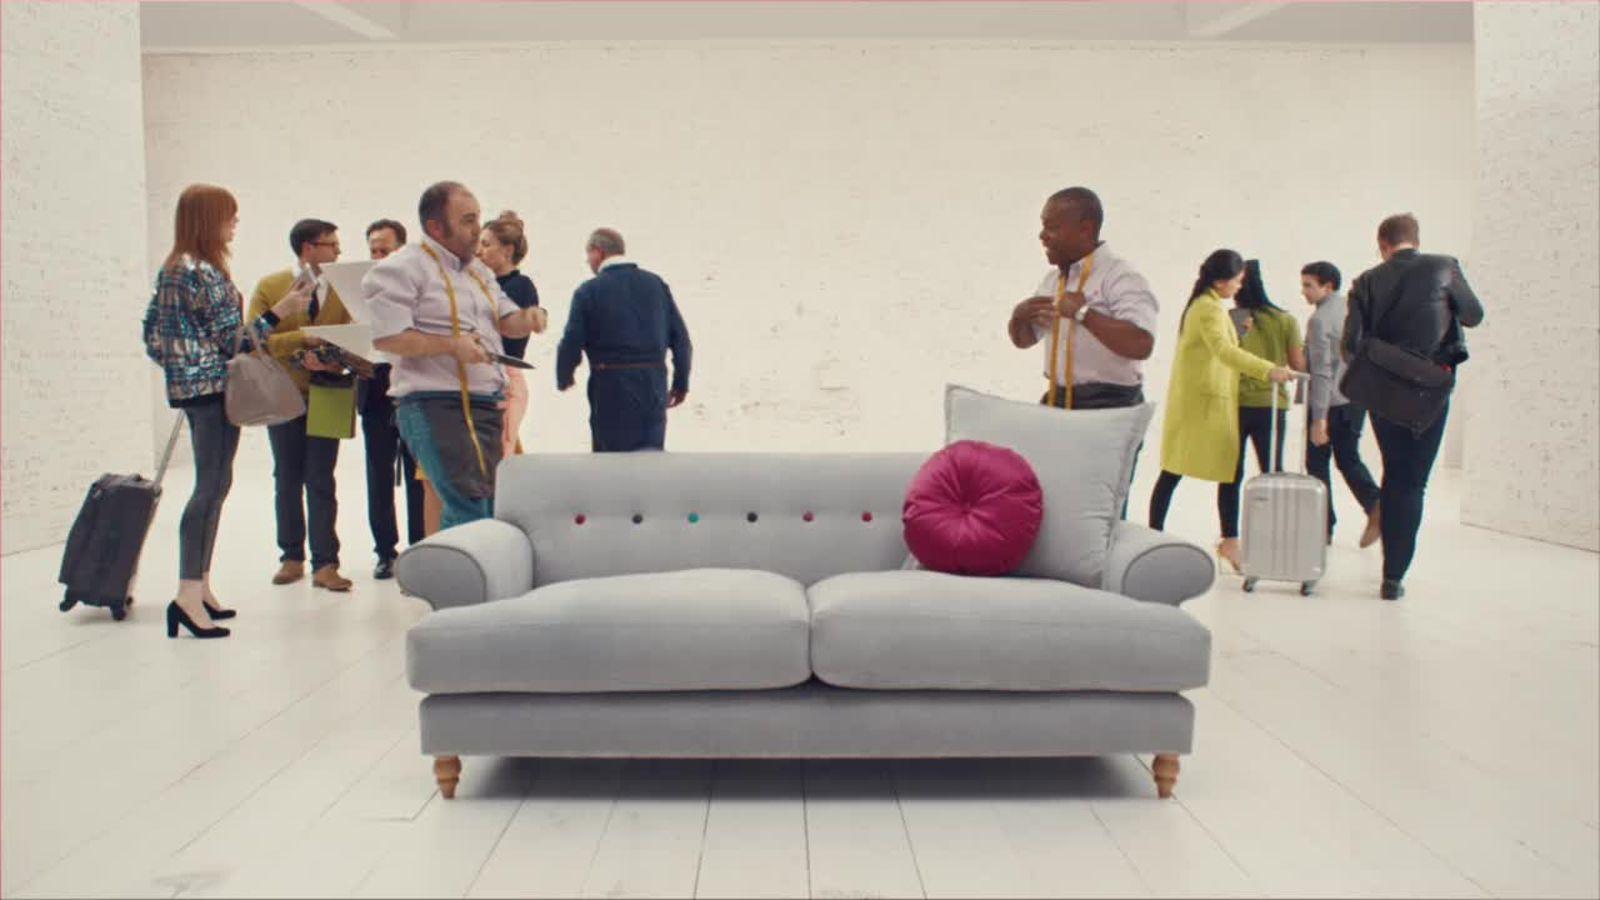 Behind The Sofa